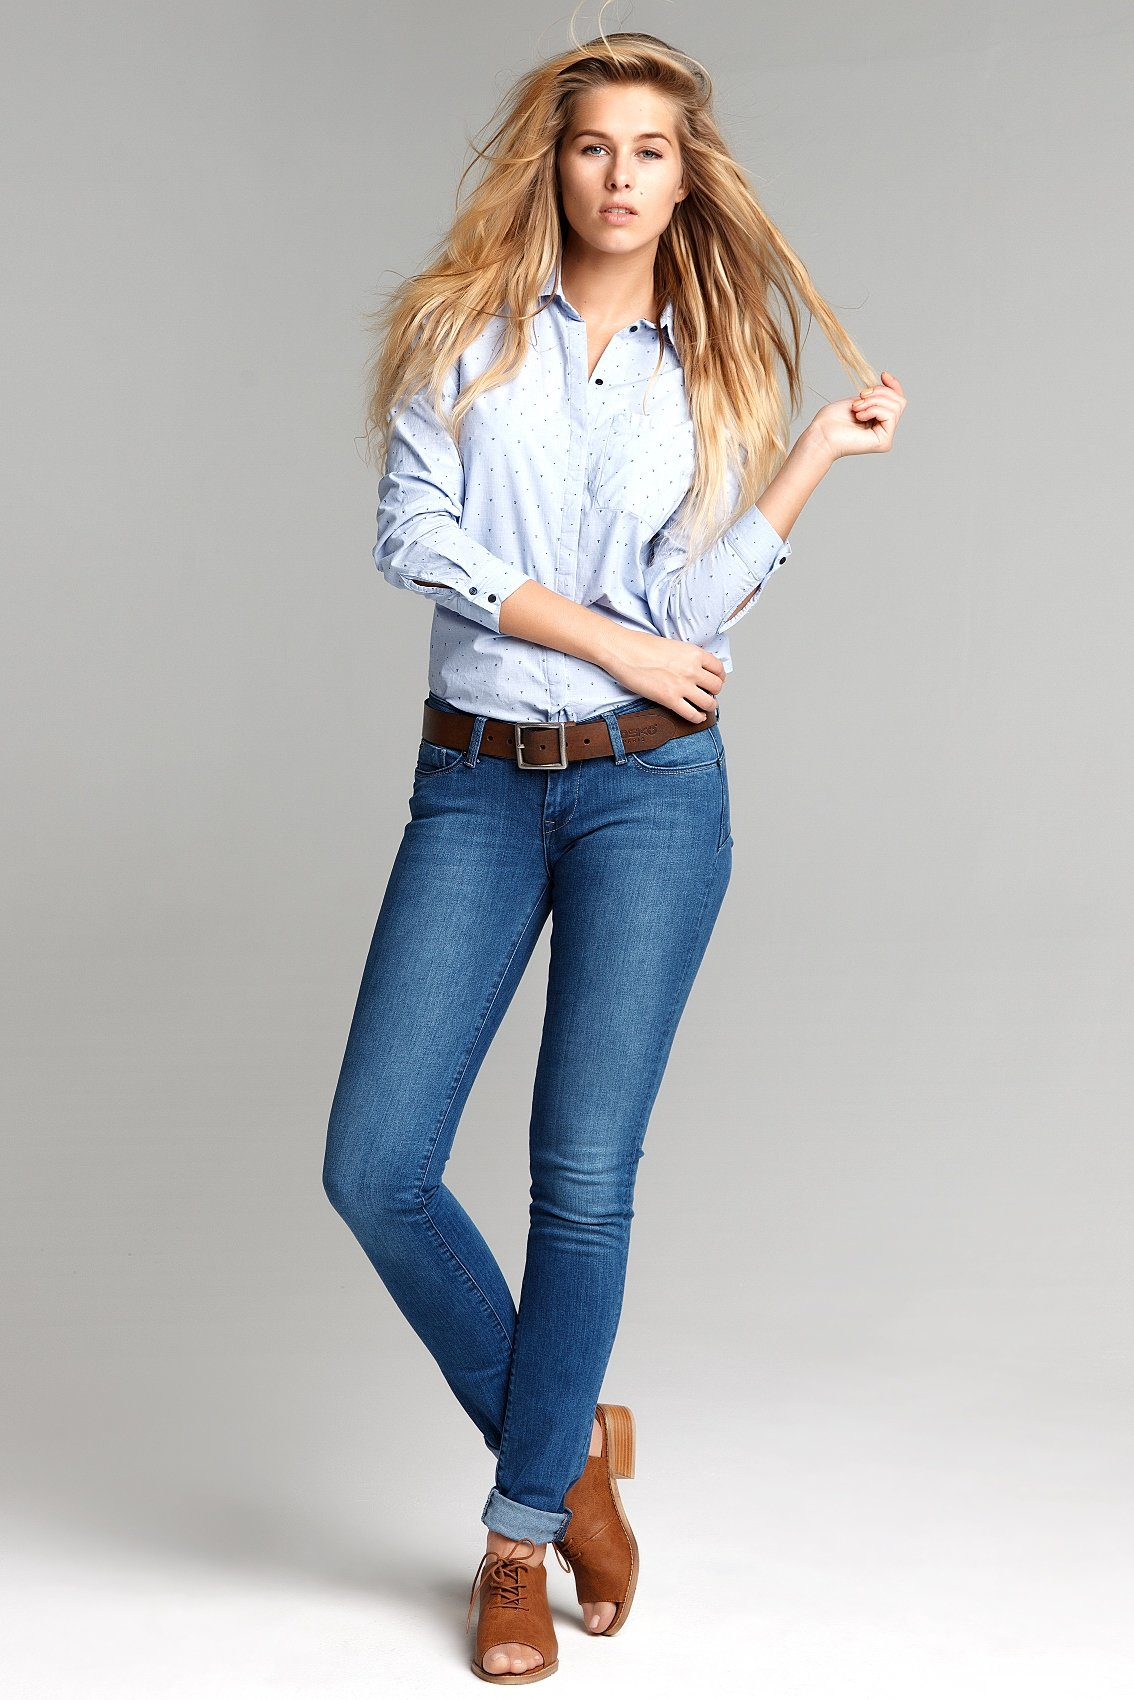 фото галереи женщин в джинсах и брюках - 14